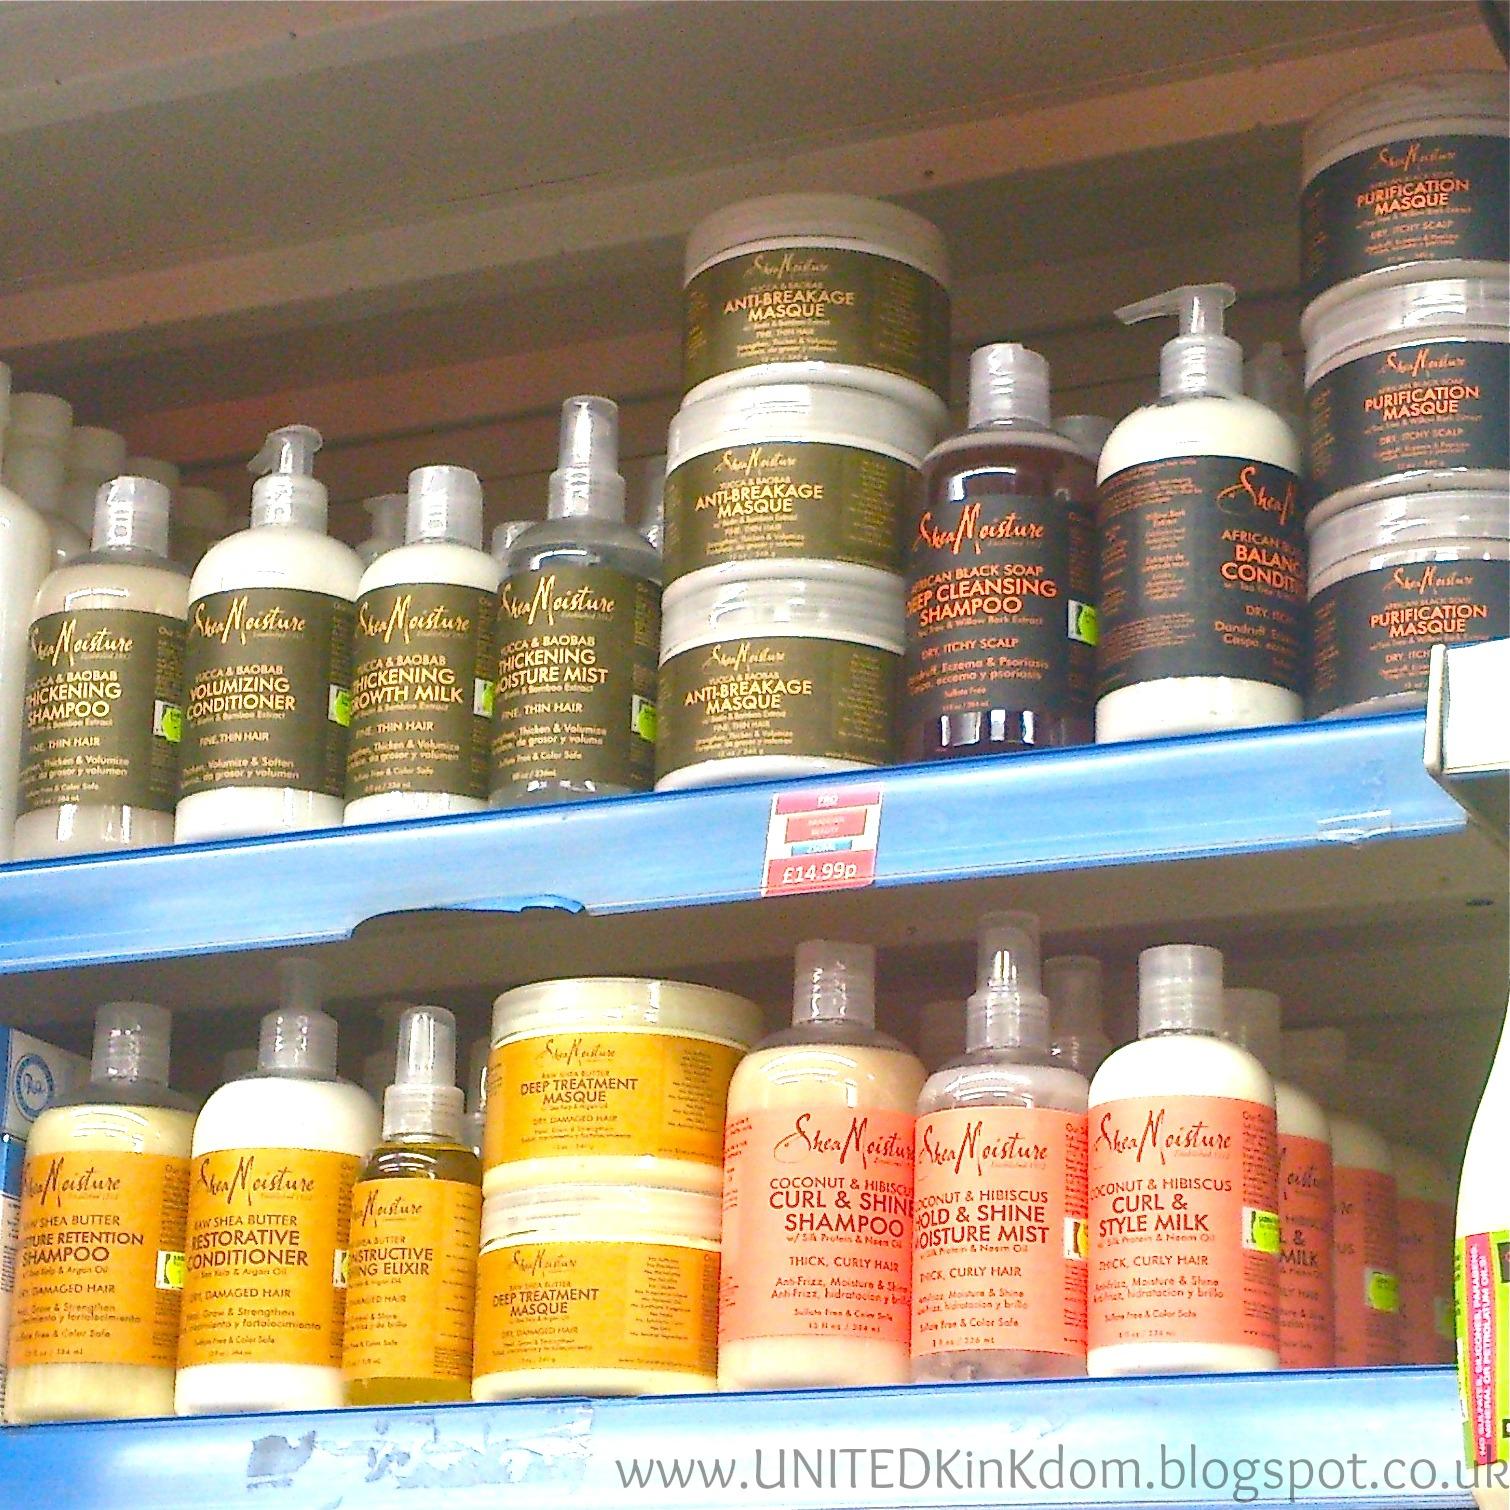 UNITED KinKdom: Shea Moisture Finally in UK Shops! - photo#34